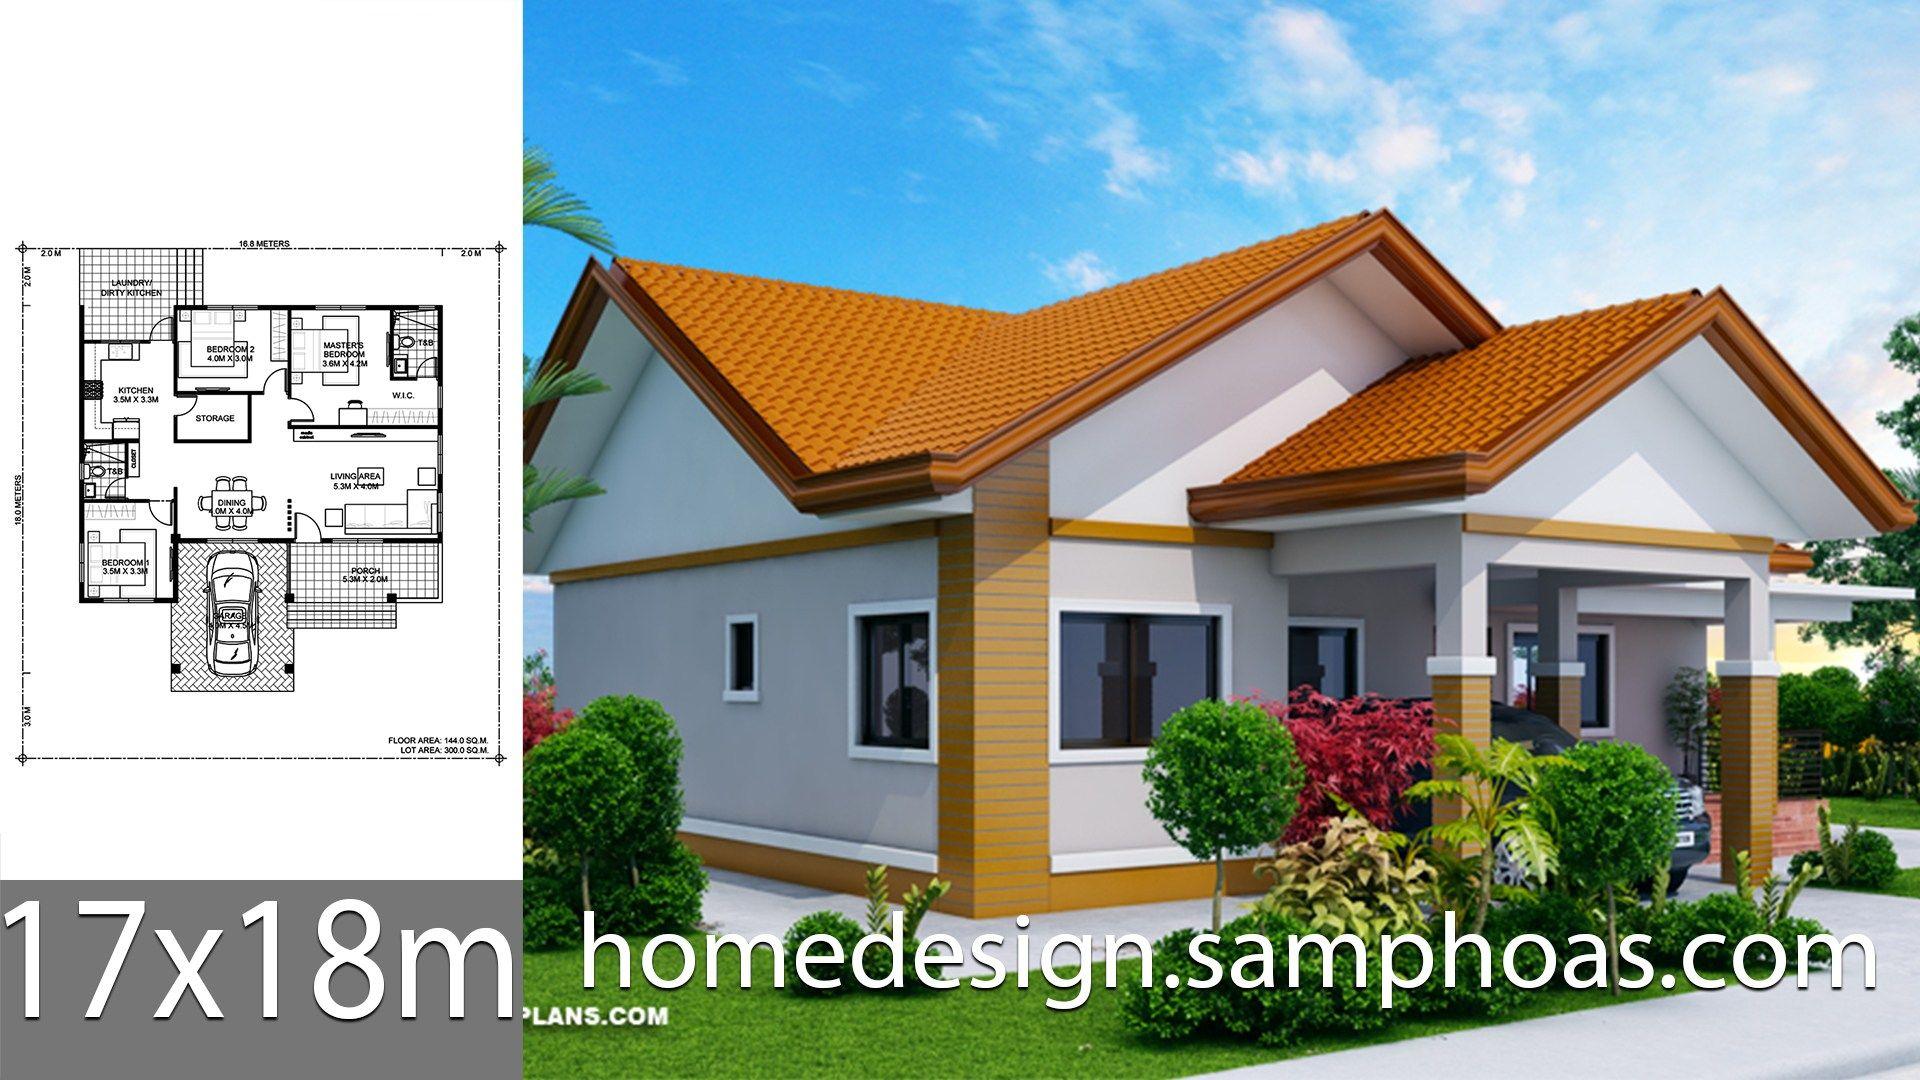 House Design Plans 17x18m With 3 Bedrooms Style Roof Tileshouse Description Ground Level 3 Bedr Home Design Plans House Construction Plan Simple House Design